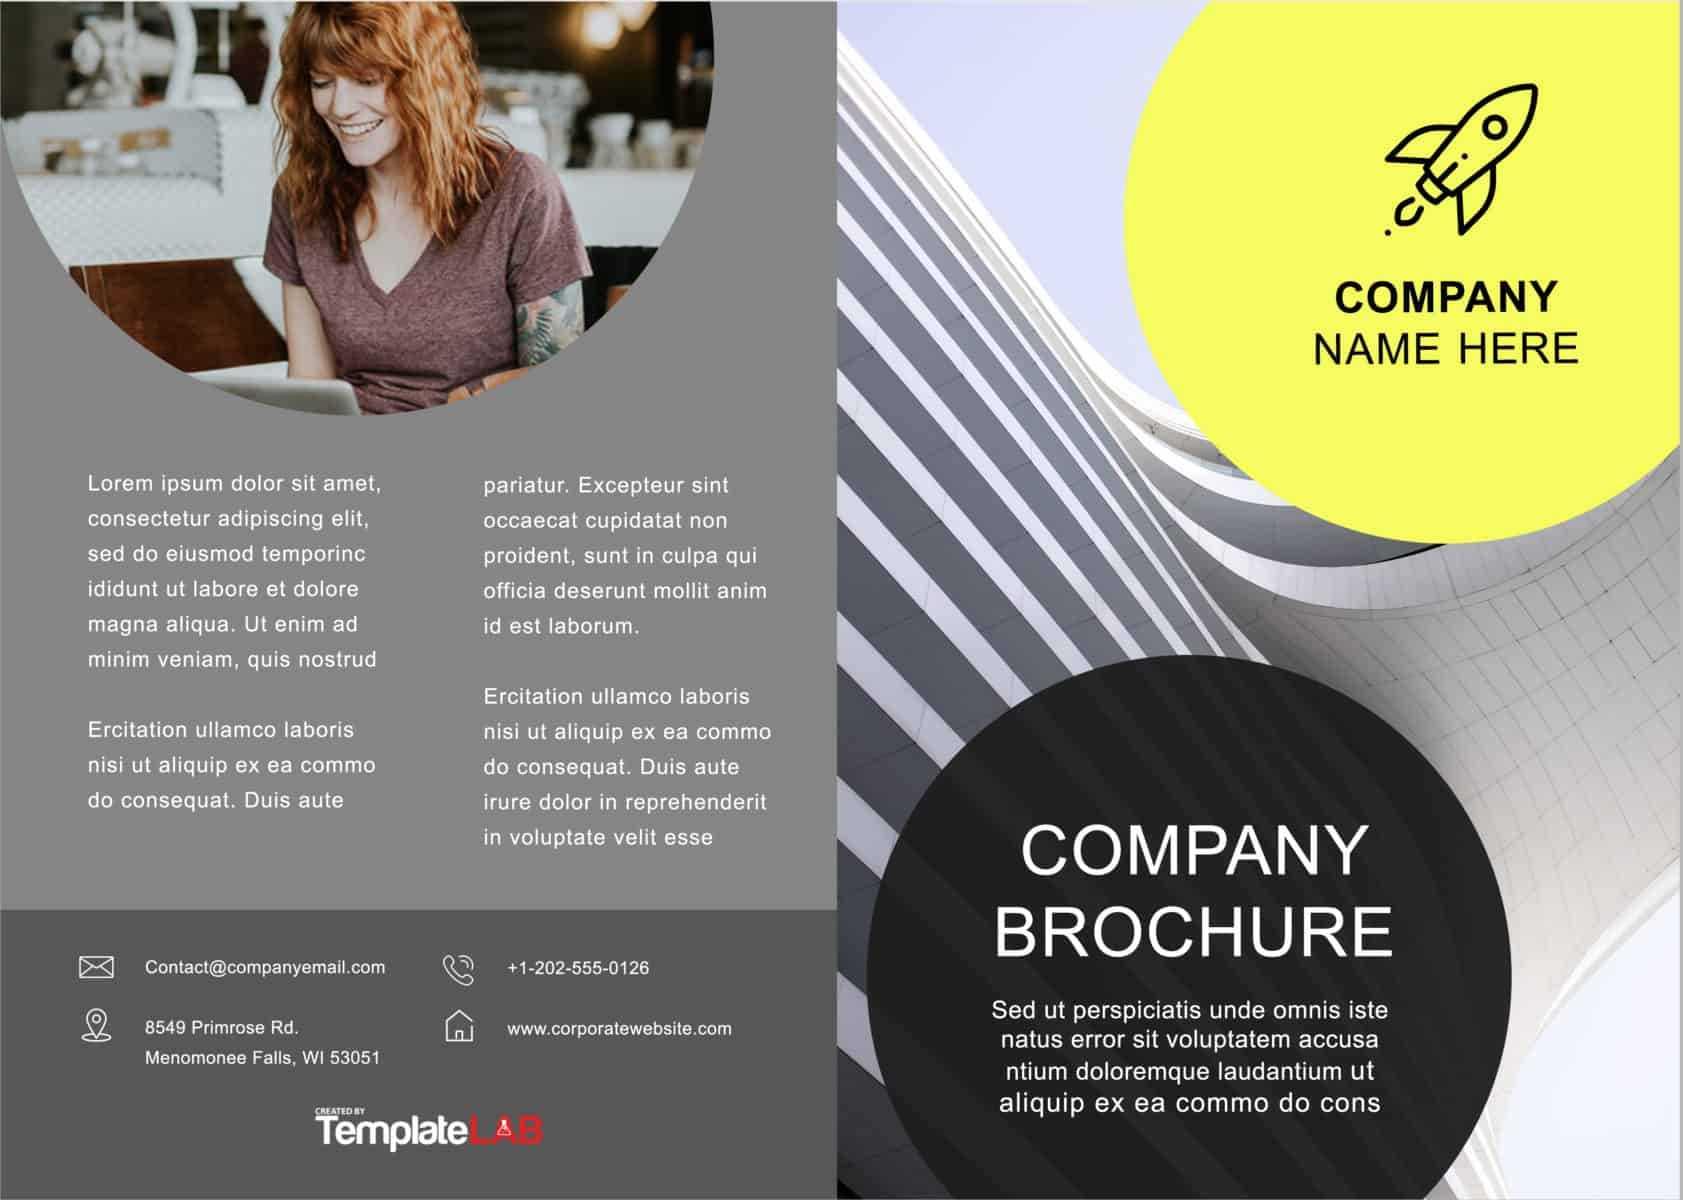 33 Free Brochure Templates (Word + Pdf) ᐅ Template Lab With Regard To Free Brochure Template Downloads